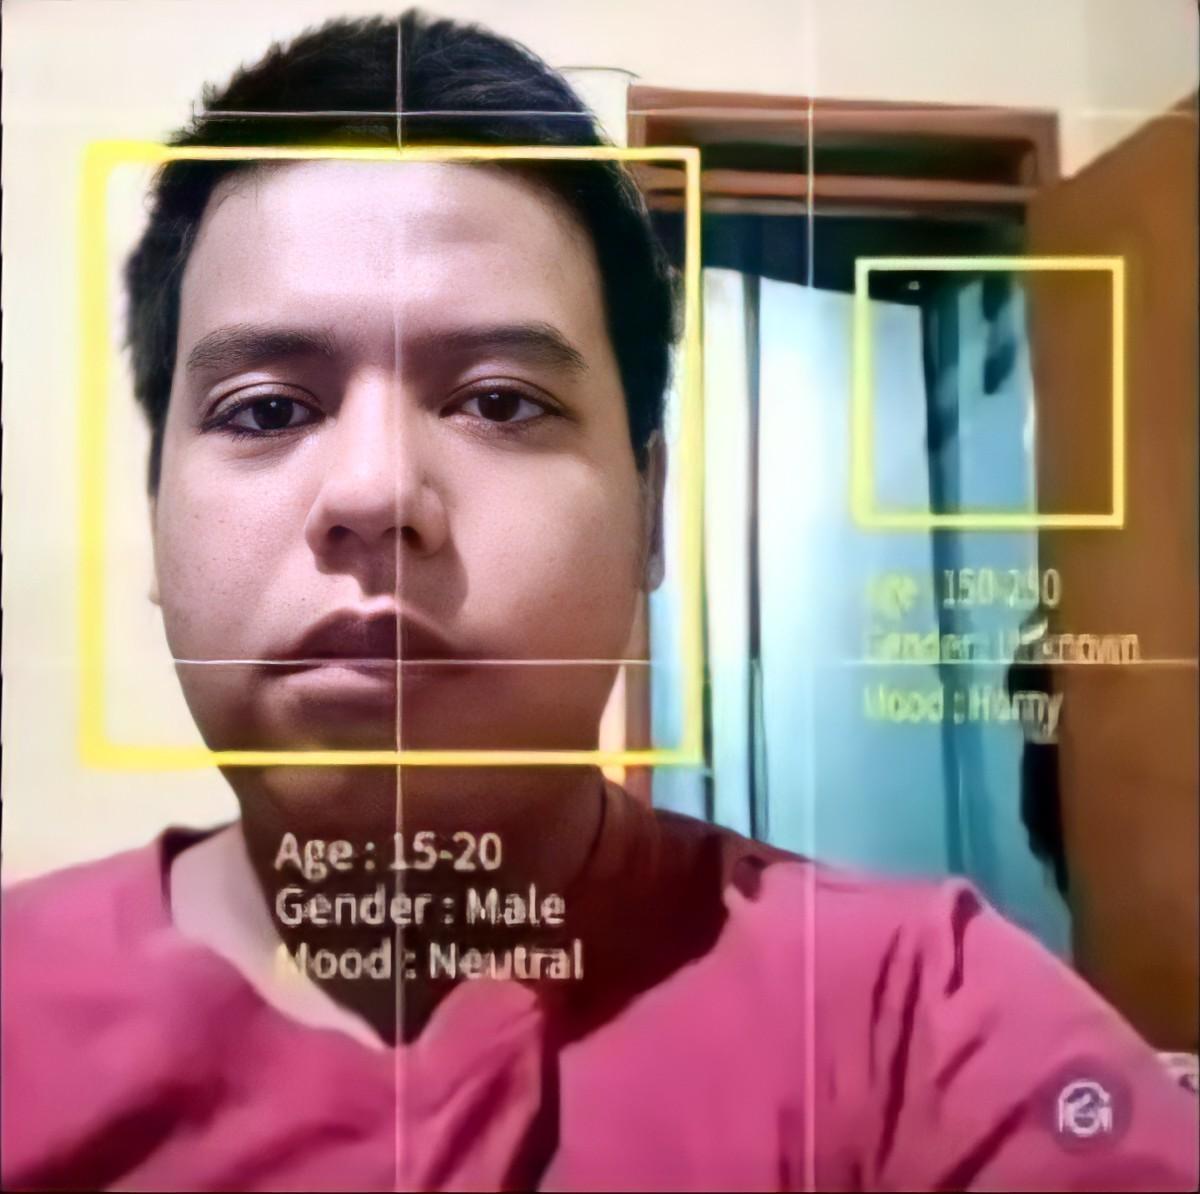 Por si no se ve bien age: 159-250 gender: unknown mood: horny? - meme